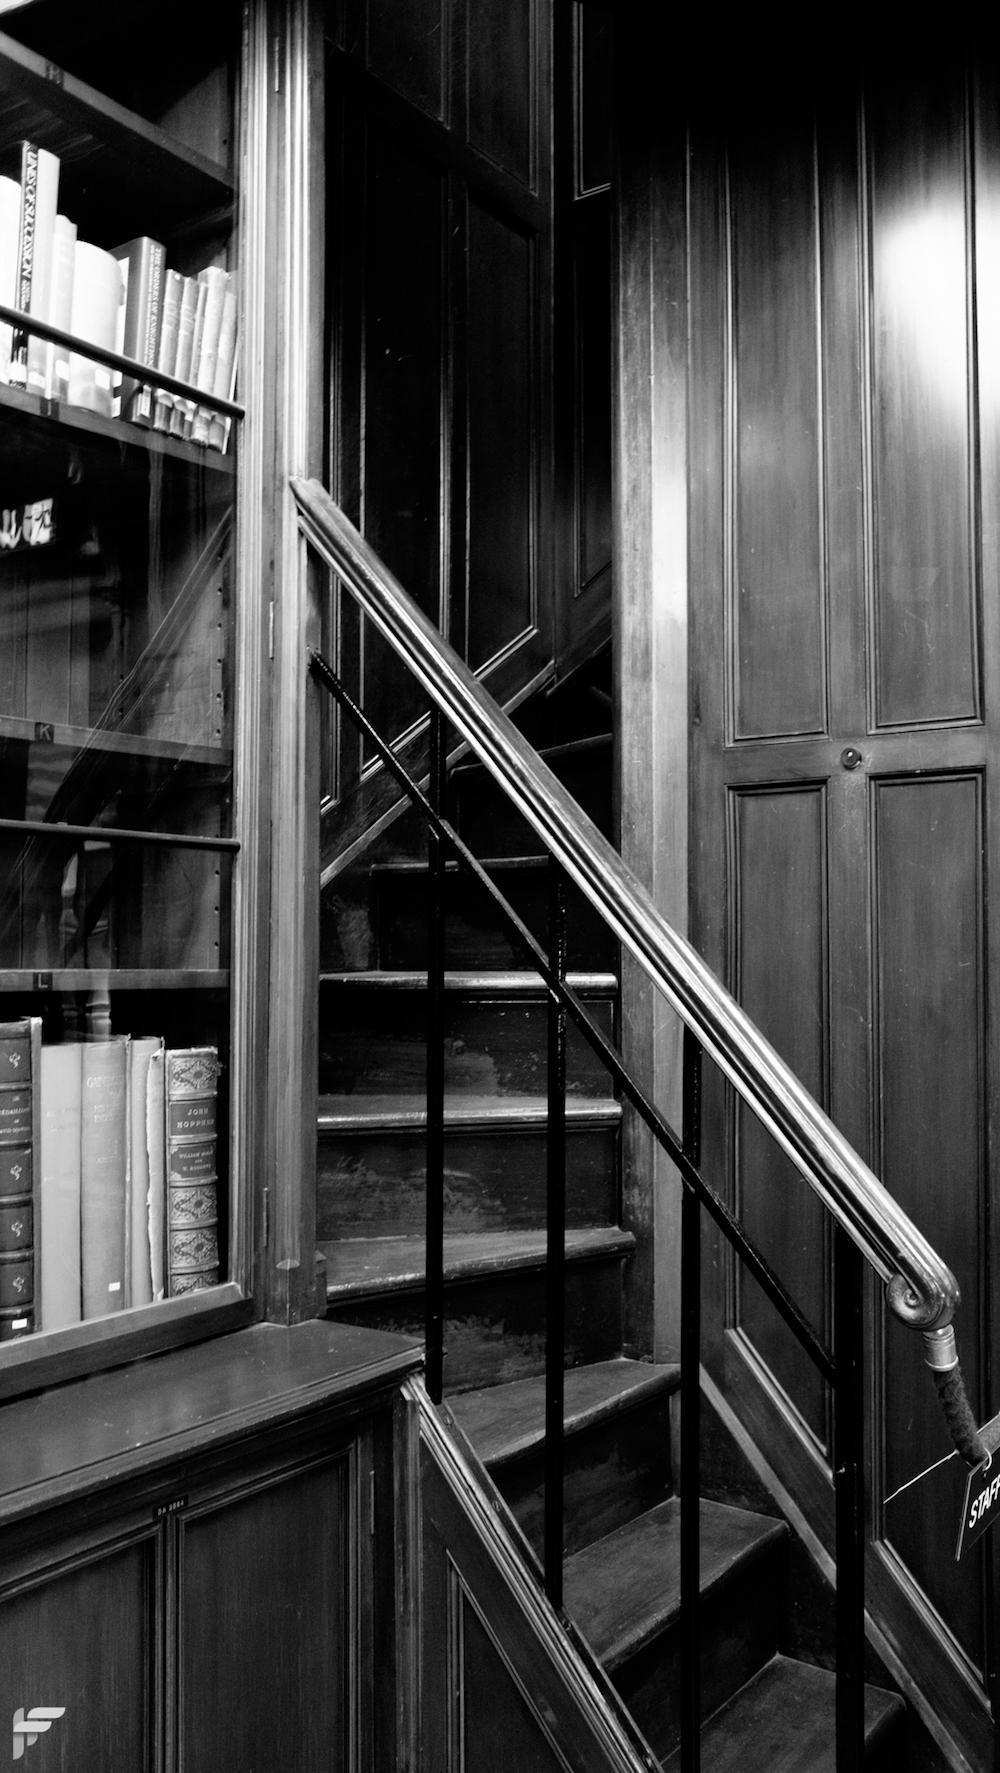 Library Staircase, Edinburgh - Fuji X70